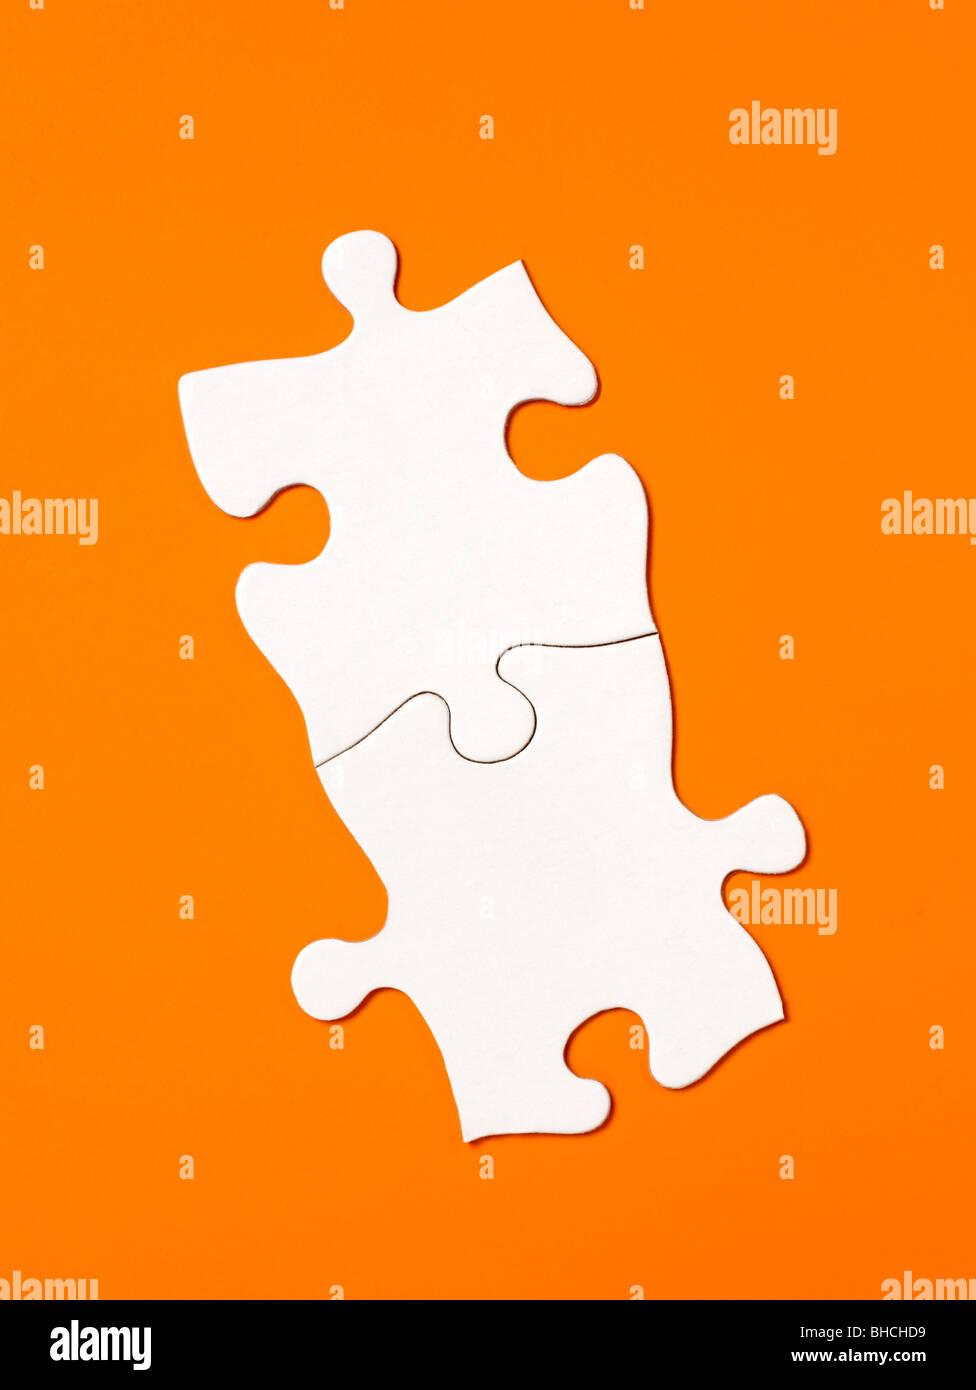 Orange white Puzzle pieces elevated view - Stock Image